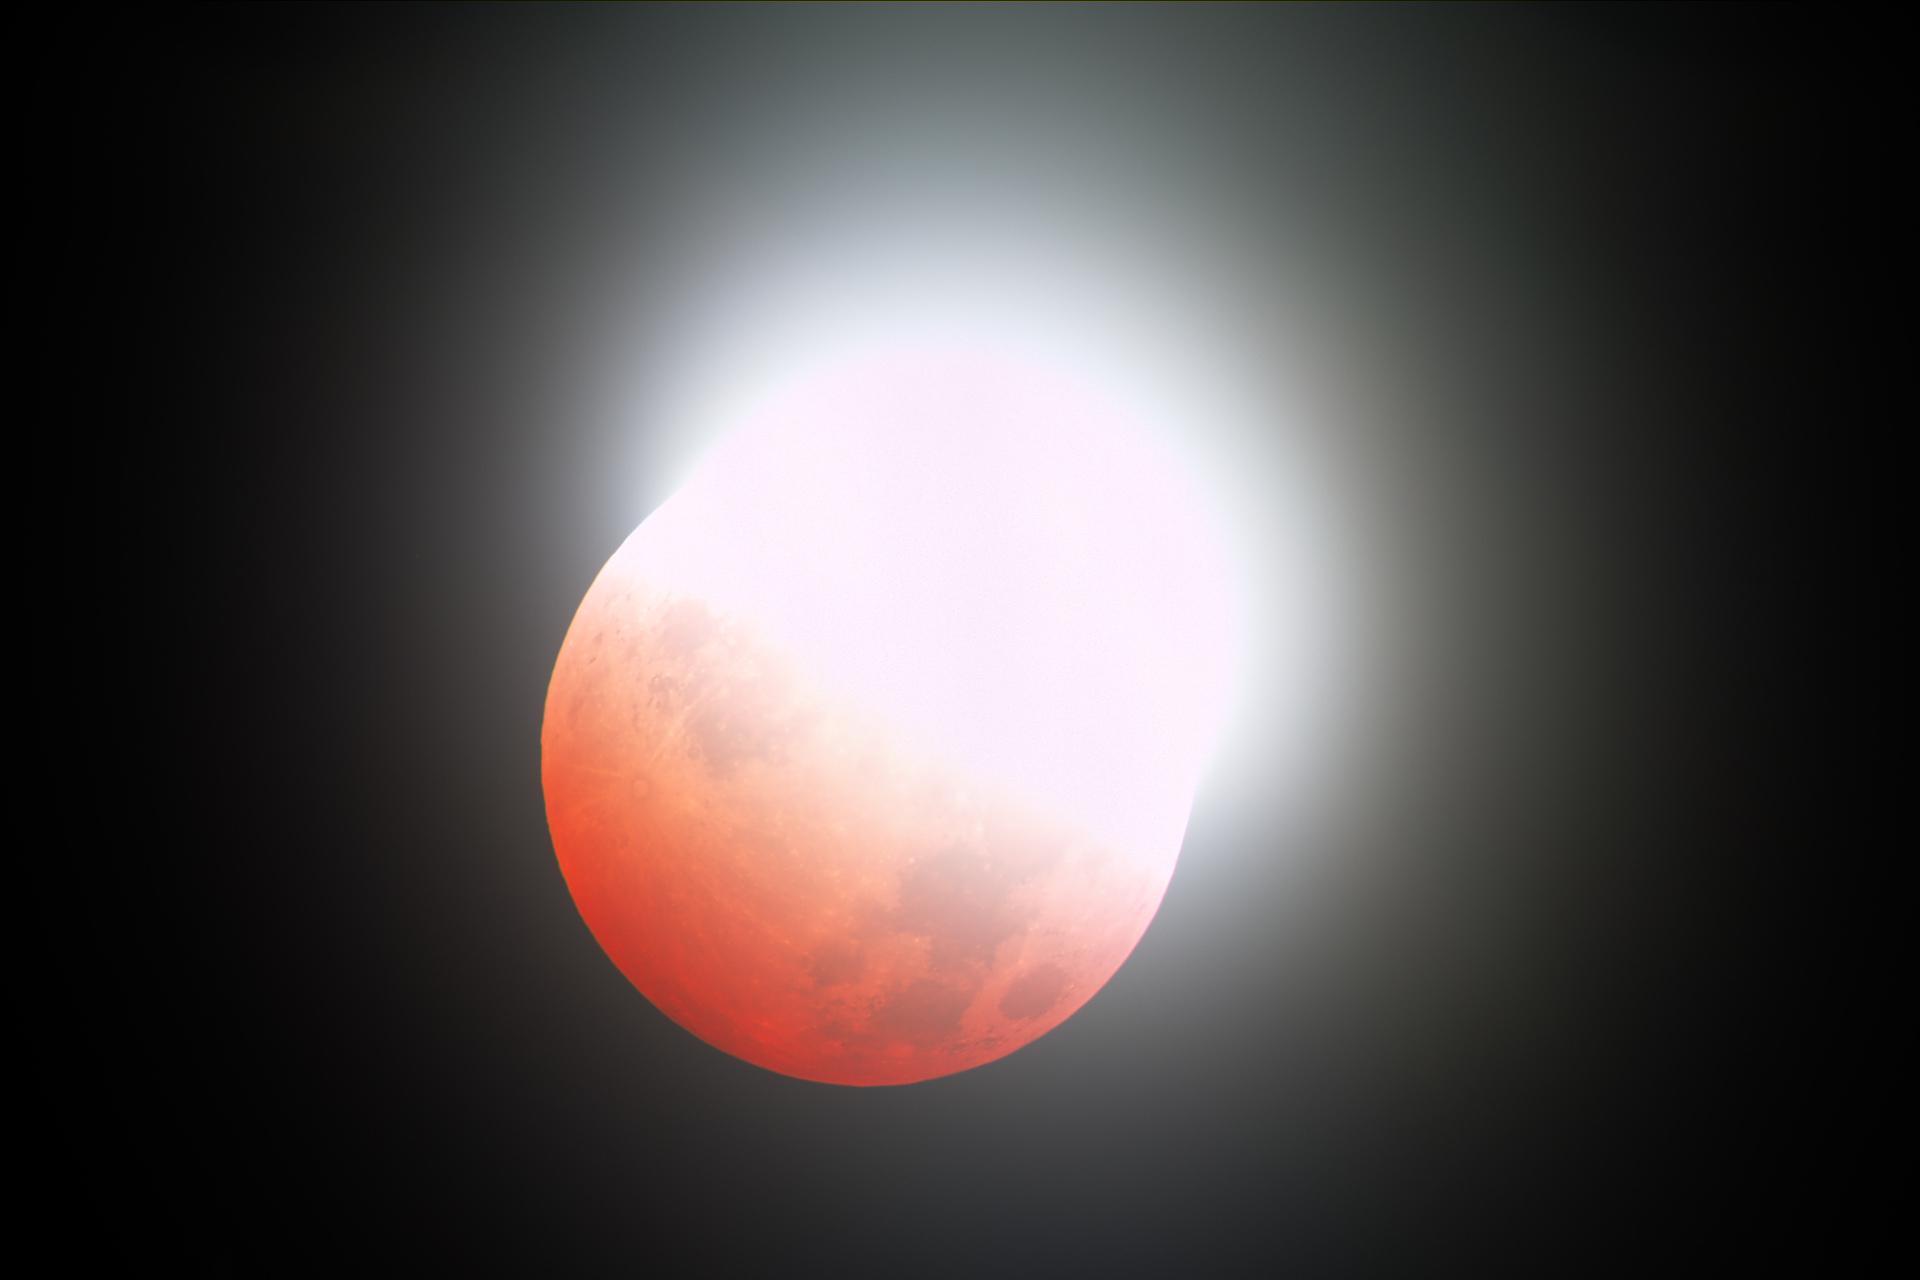 large.5c5187bcc0d67_190121-EclipsedeLune-Partielle-Pollux-STL11K.jpg.2756646250e56474db81030b4da3a215.jpg